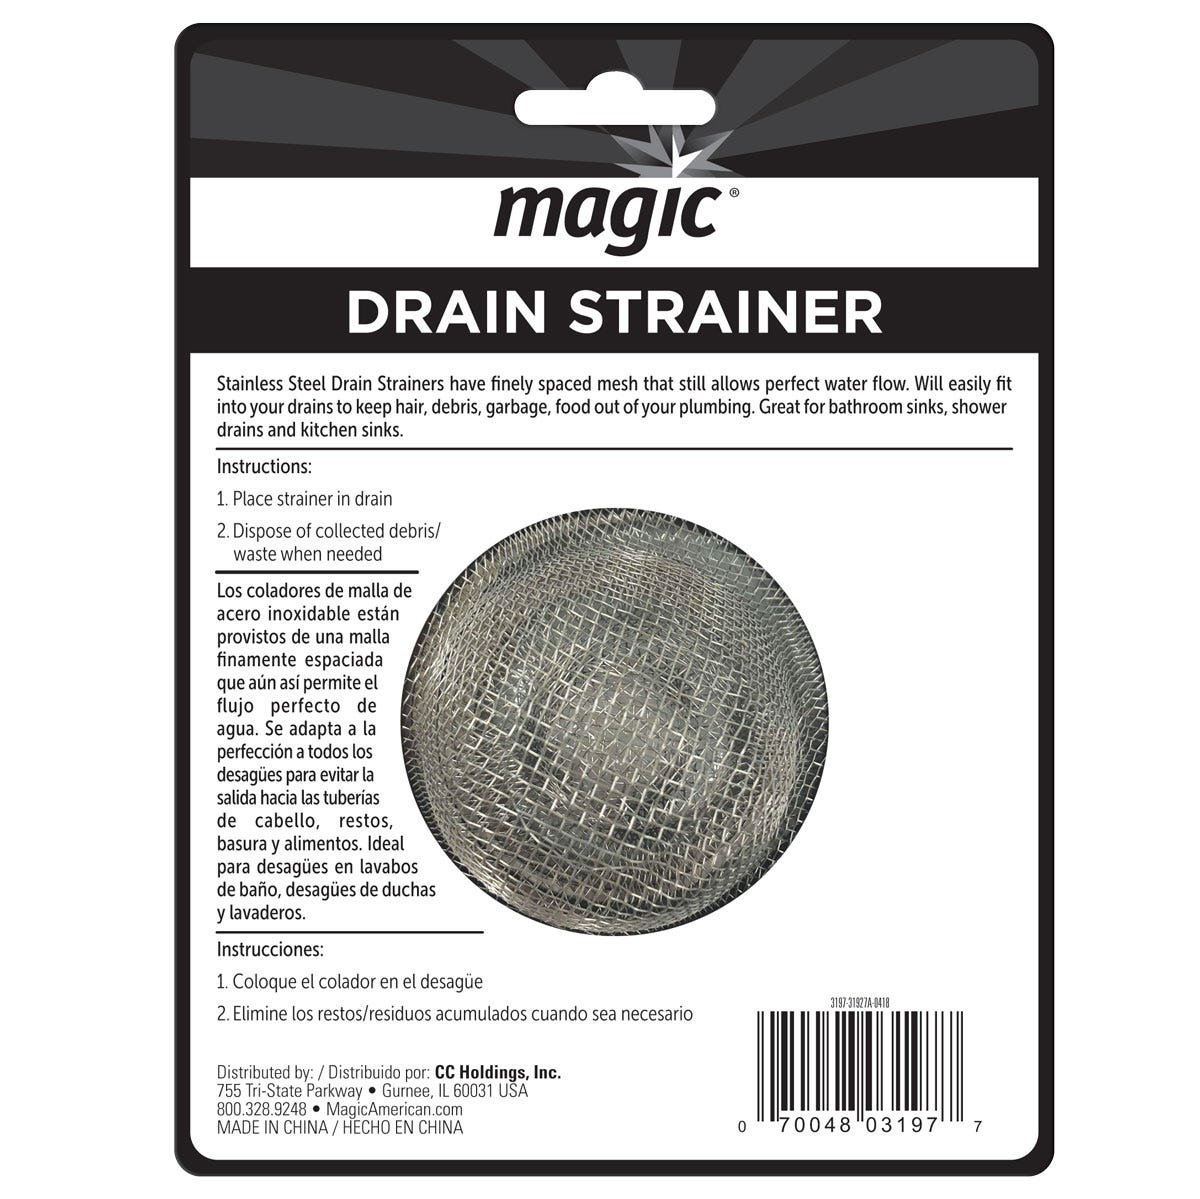 Magic Drain Strainer Back Label